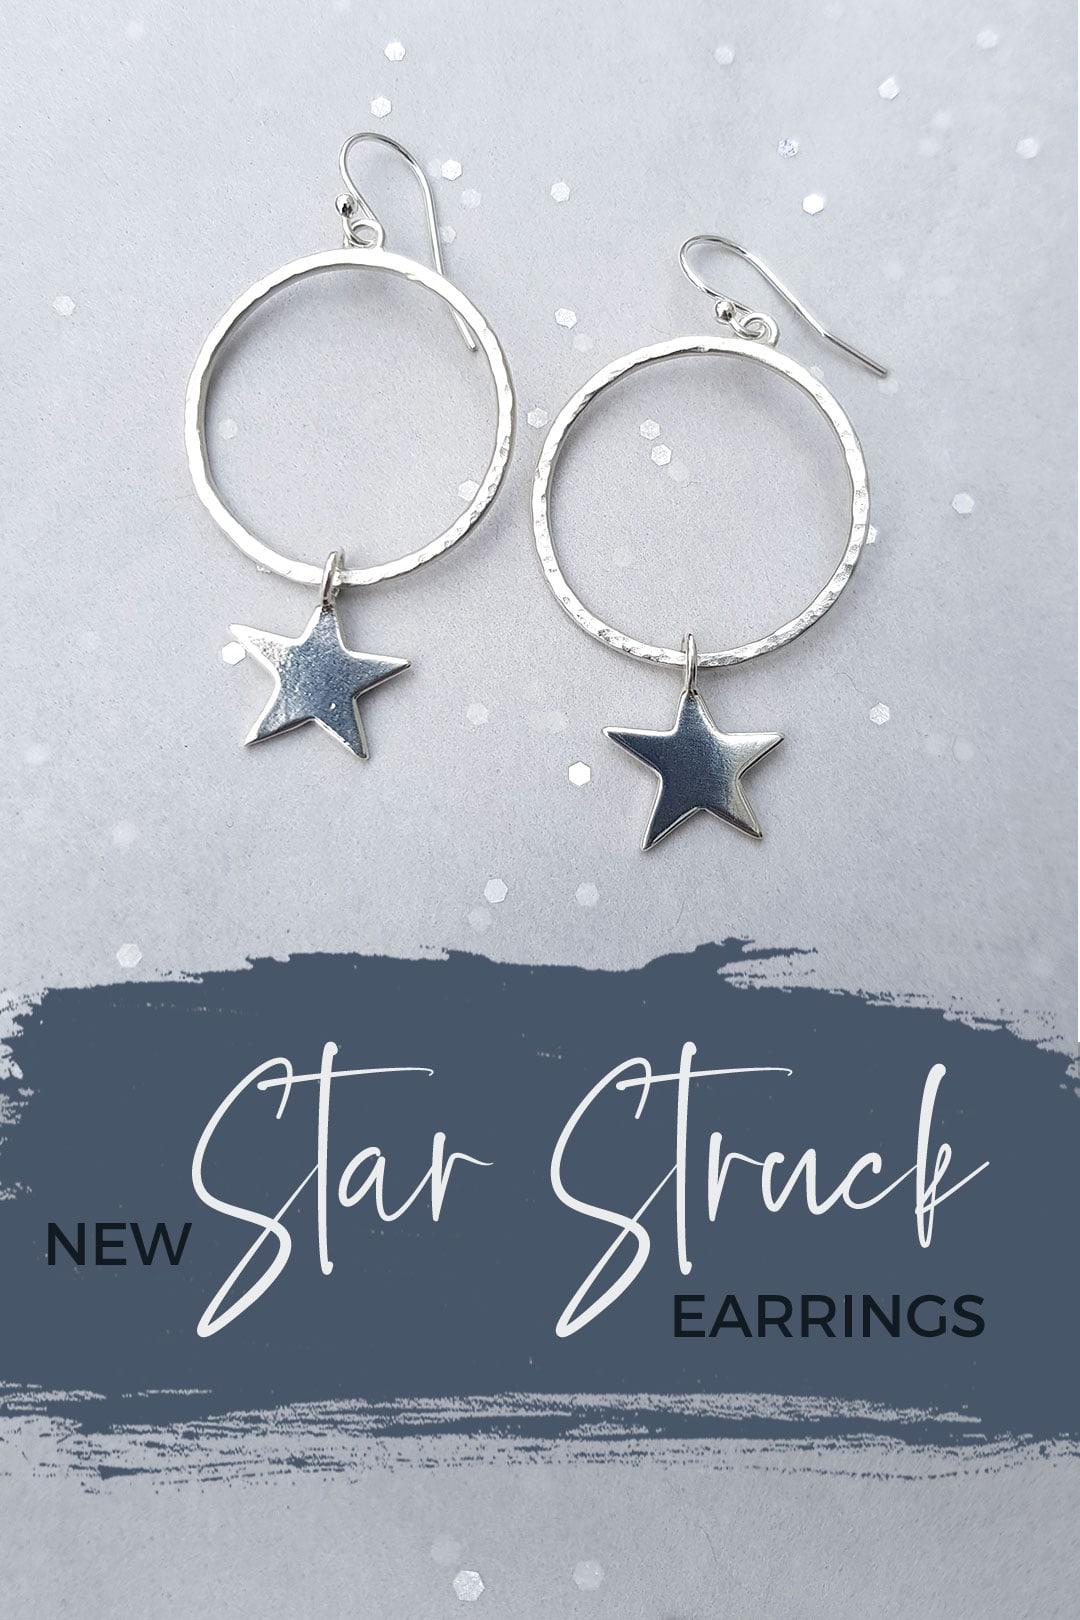 New Star Struck hoop earrings